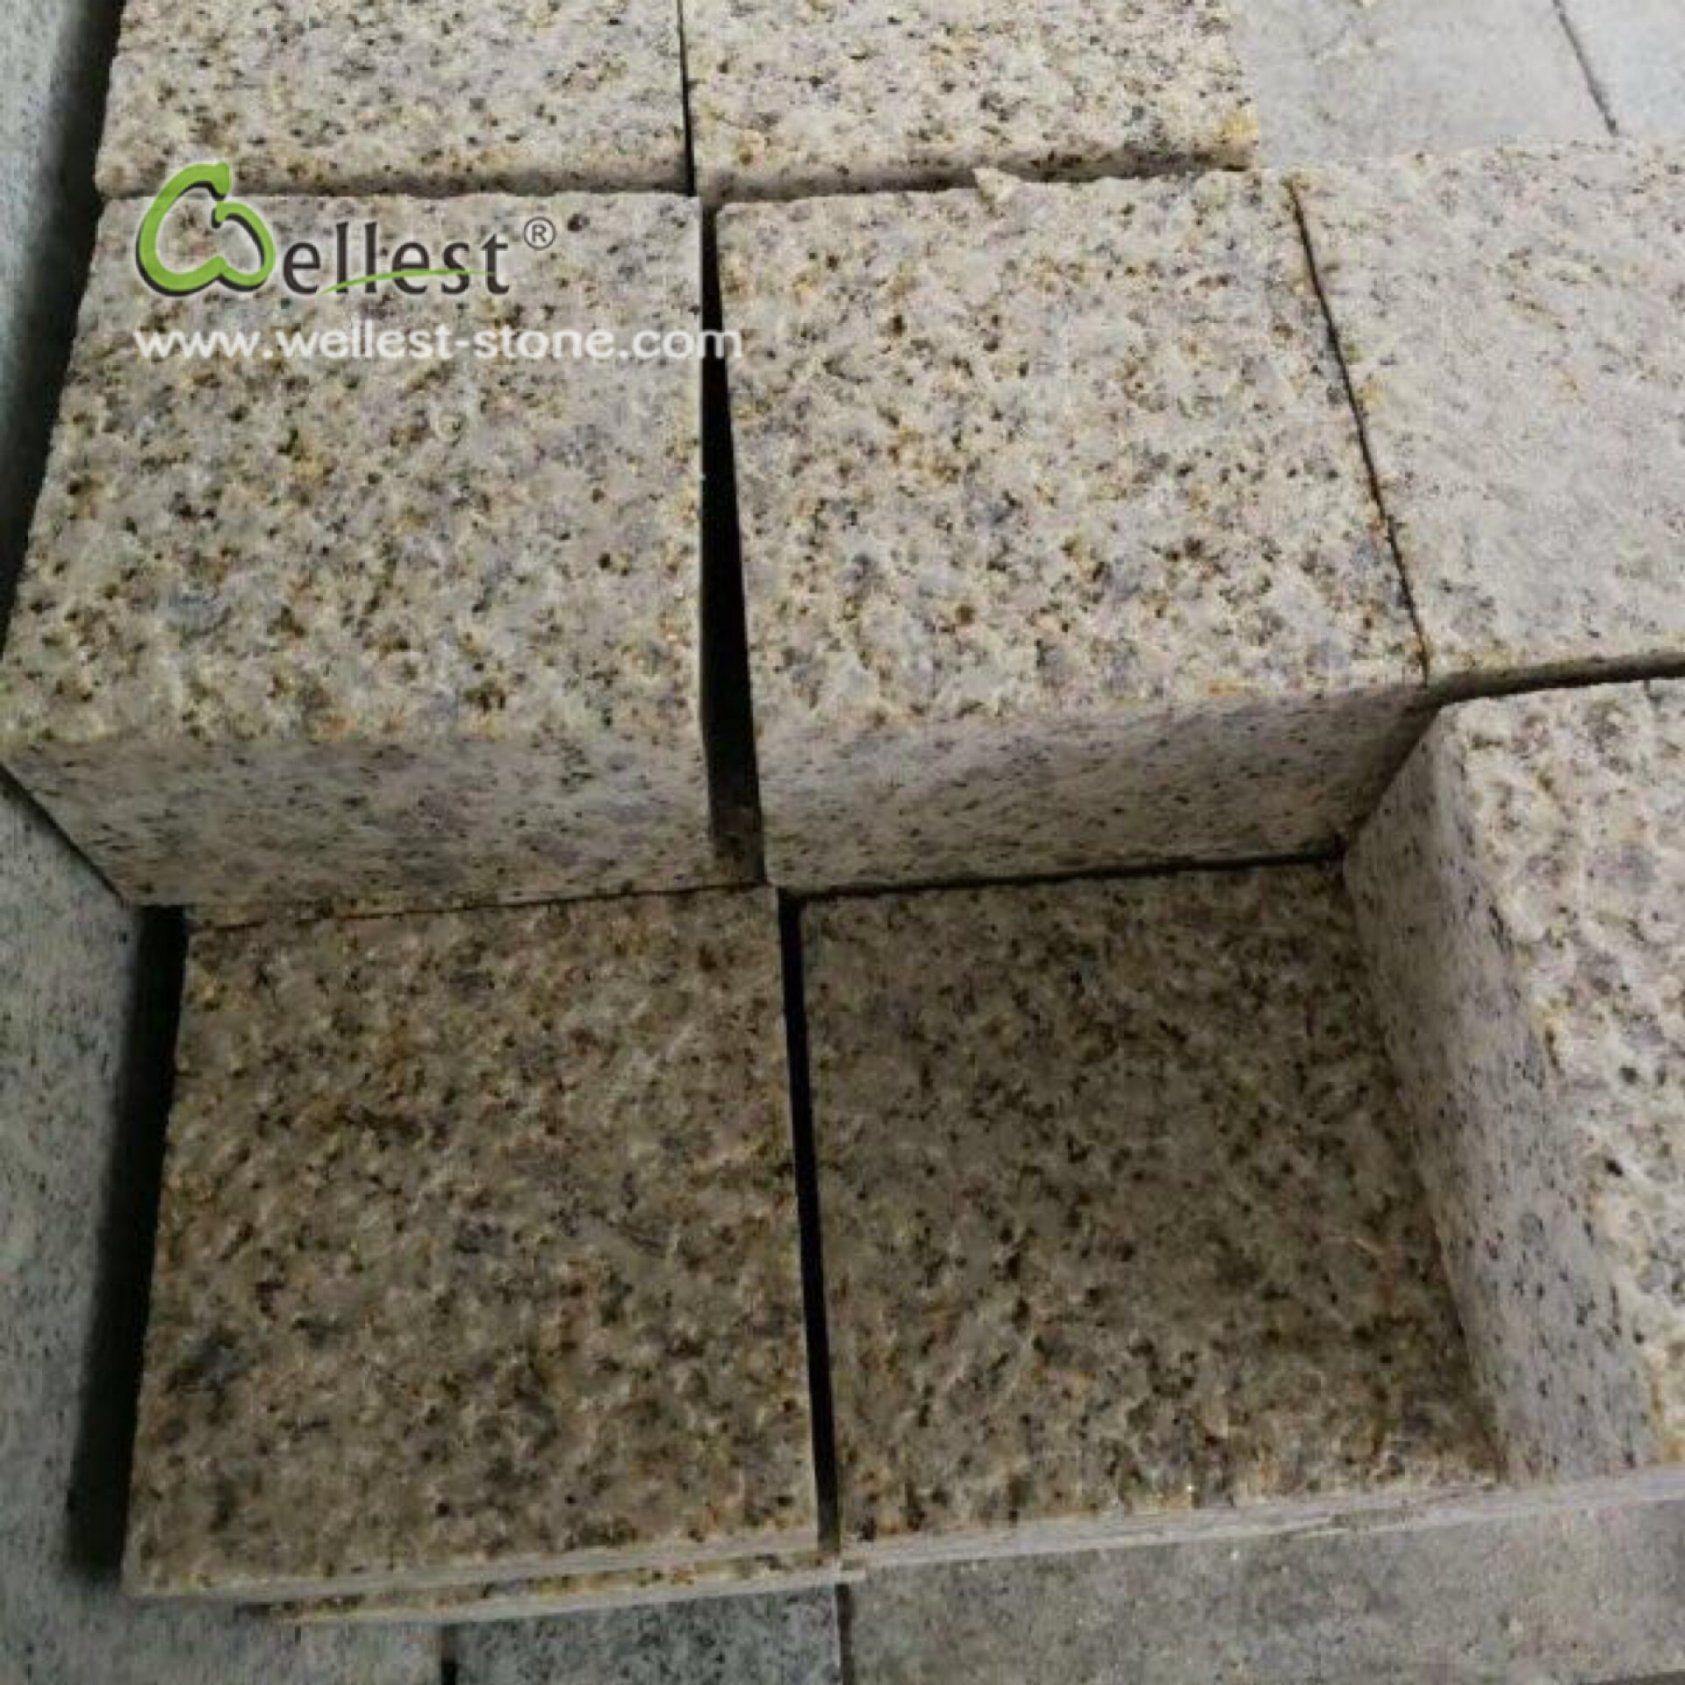 China Rustic Yellow Cobblestone Paving Granite Stone 10X10X5cm Bush Hammered